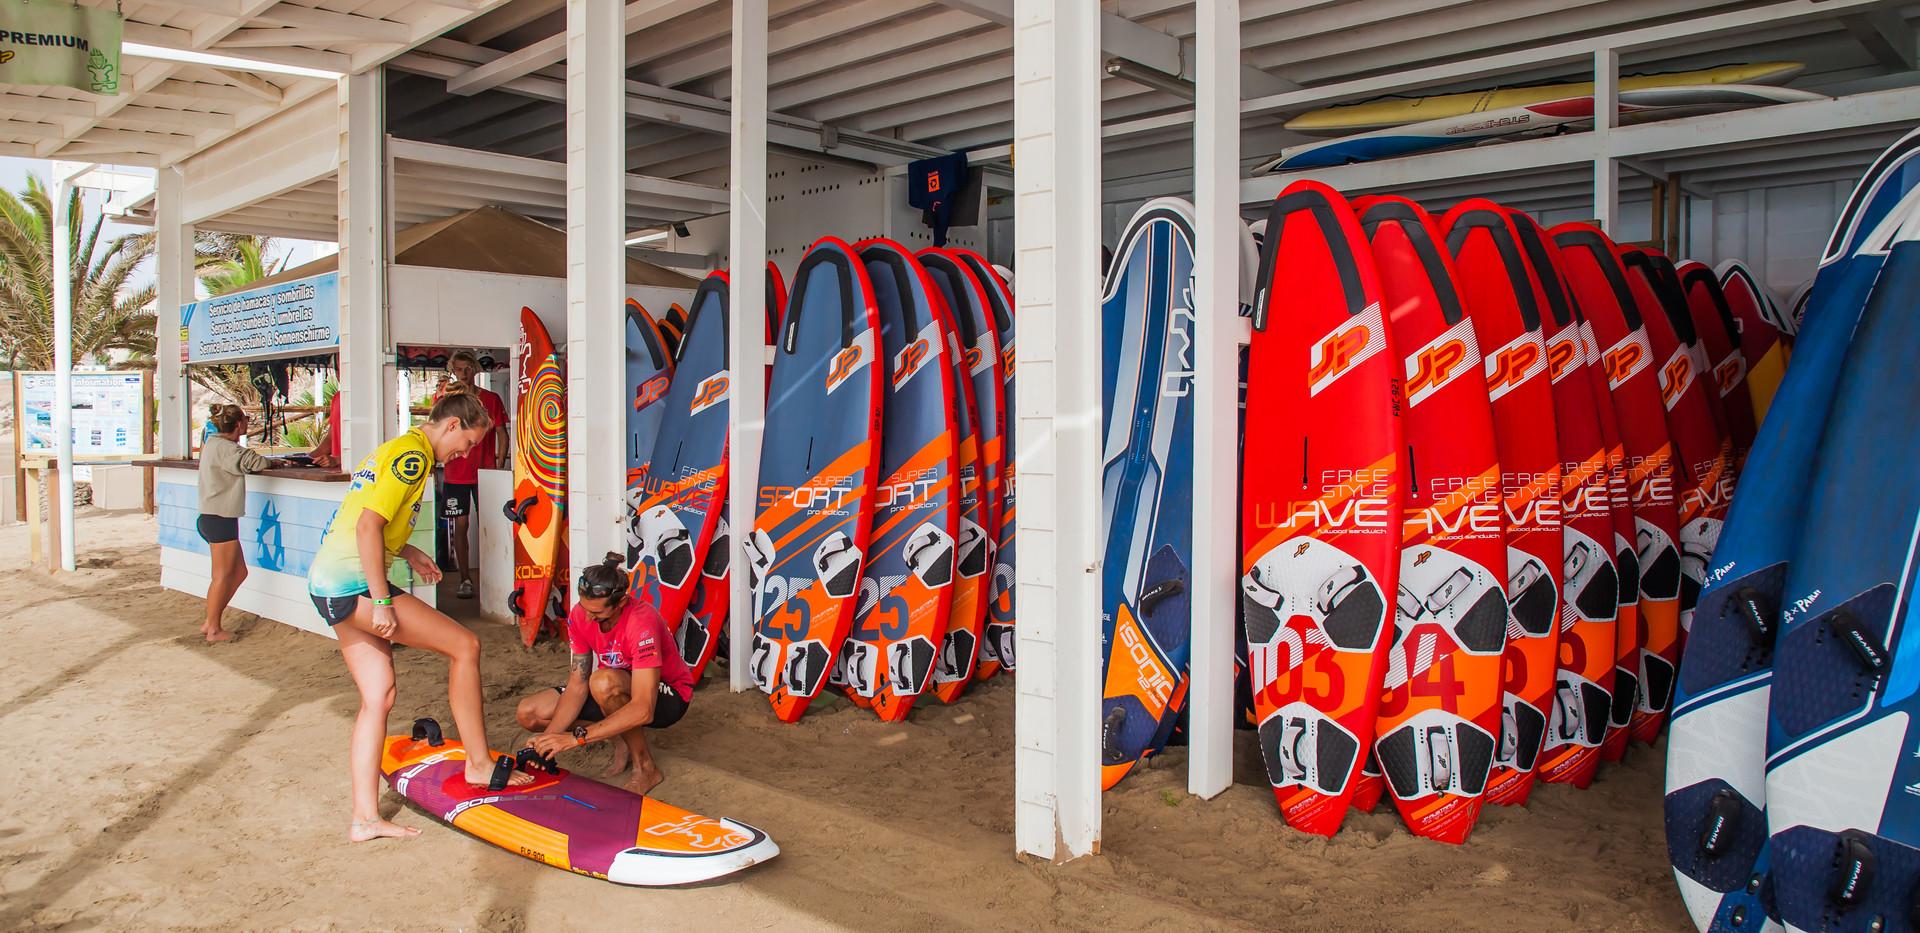 René_Egli_Windsurf-Center_Boards.jpg